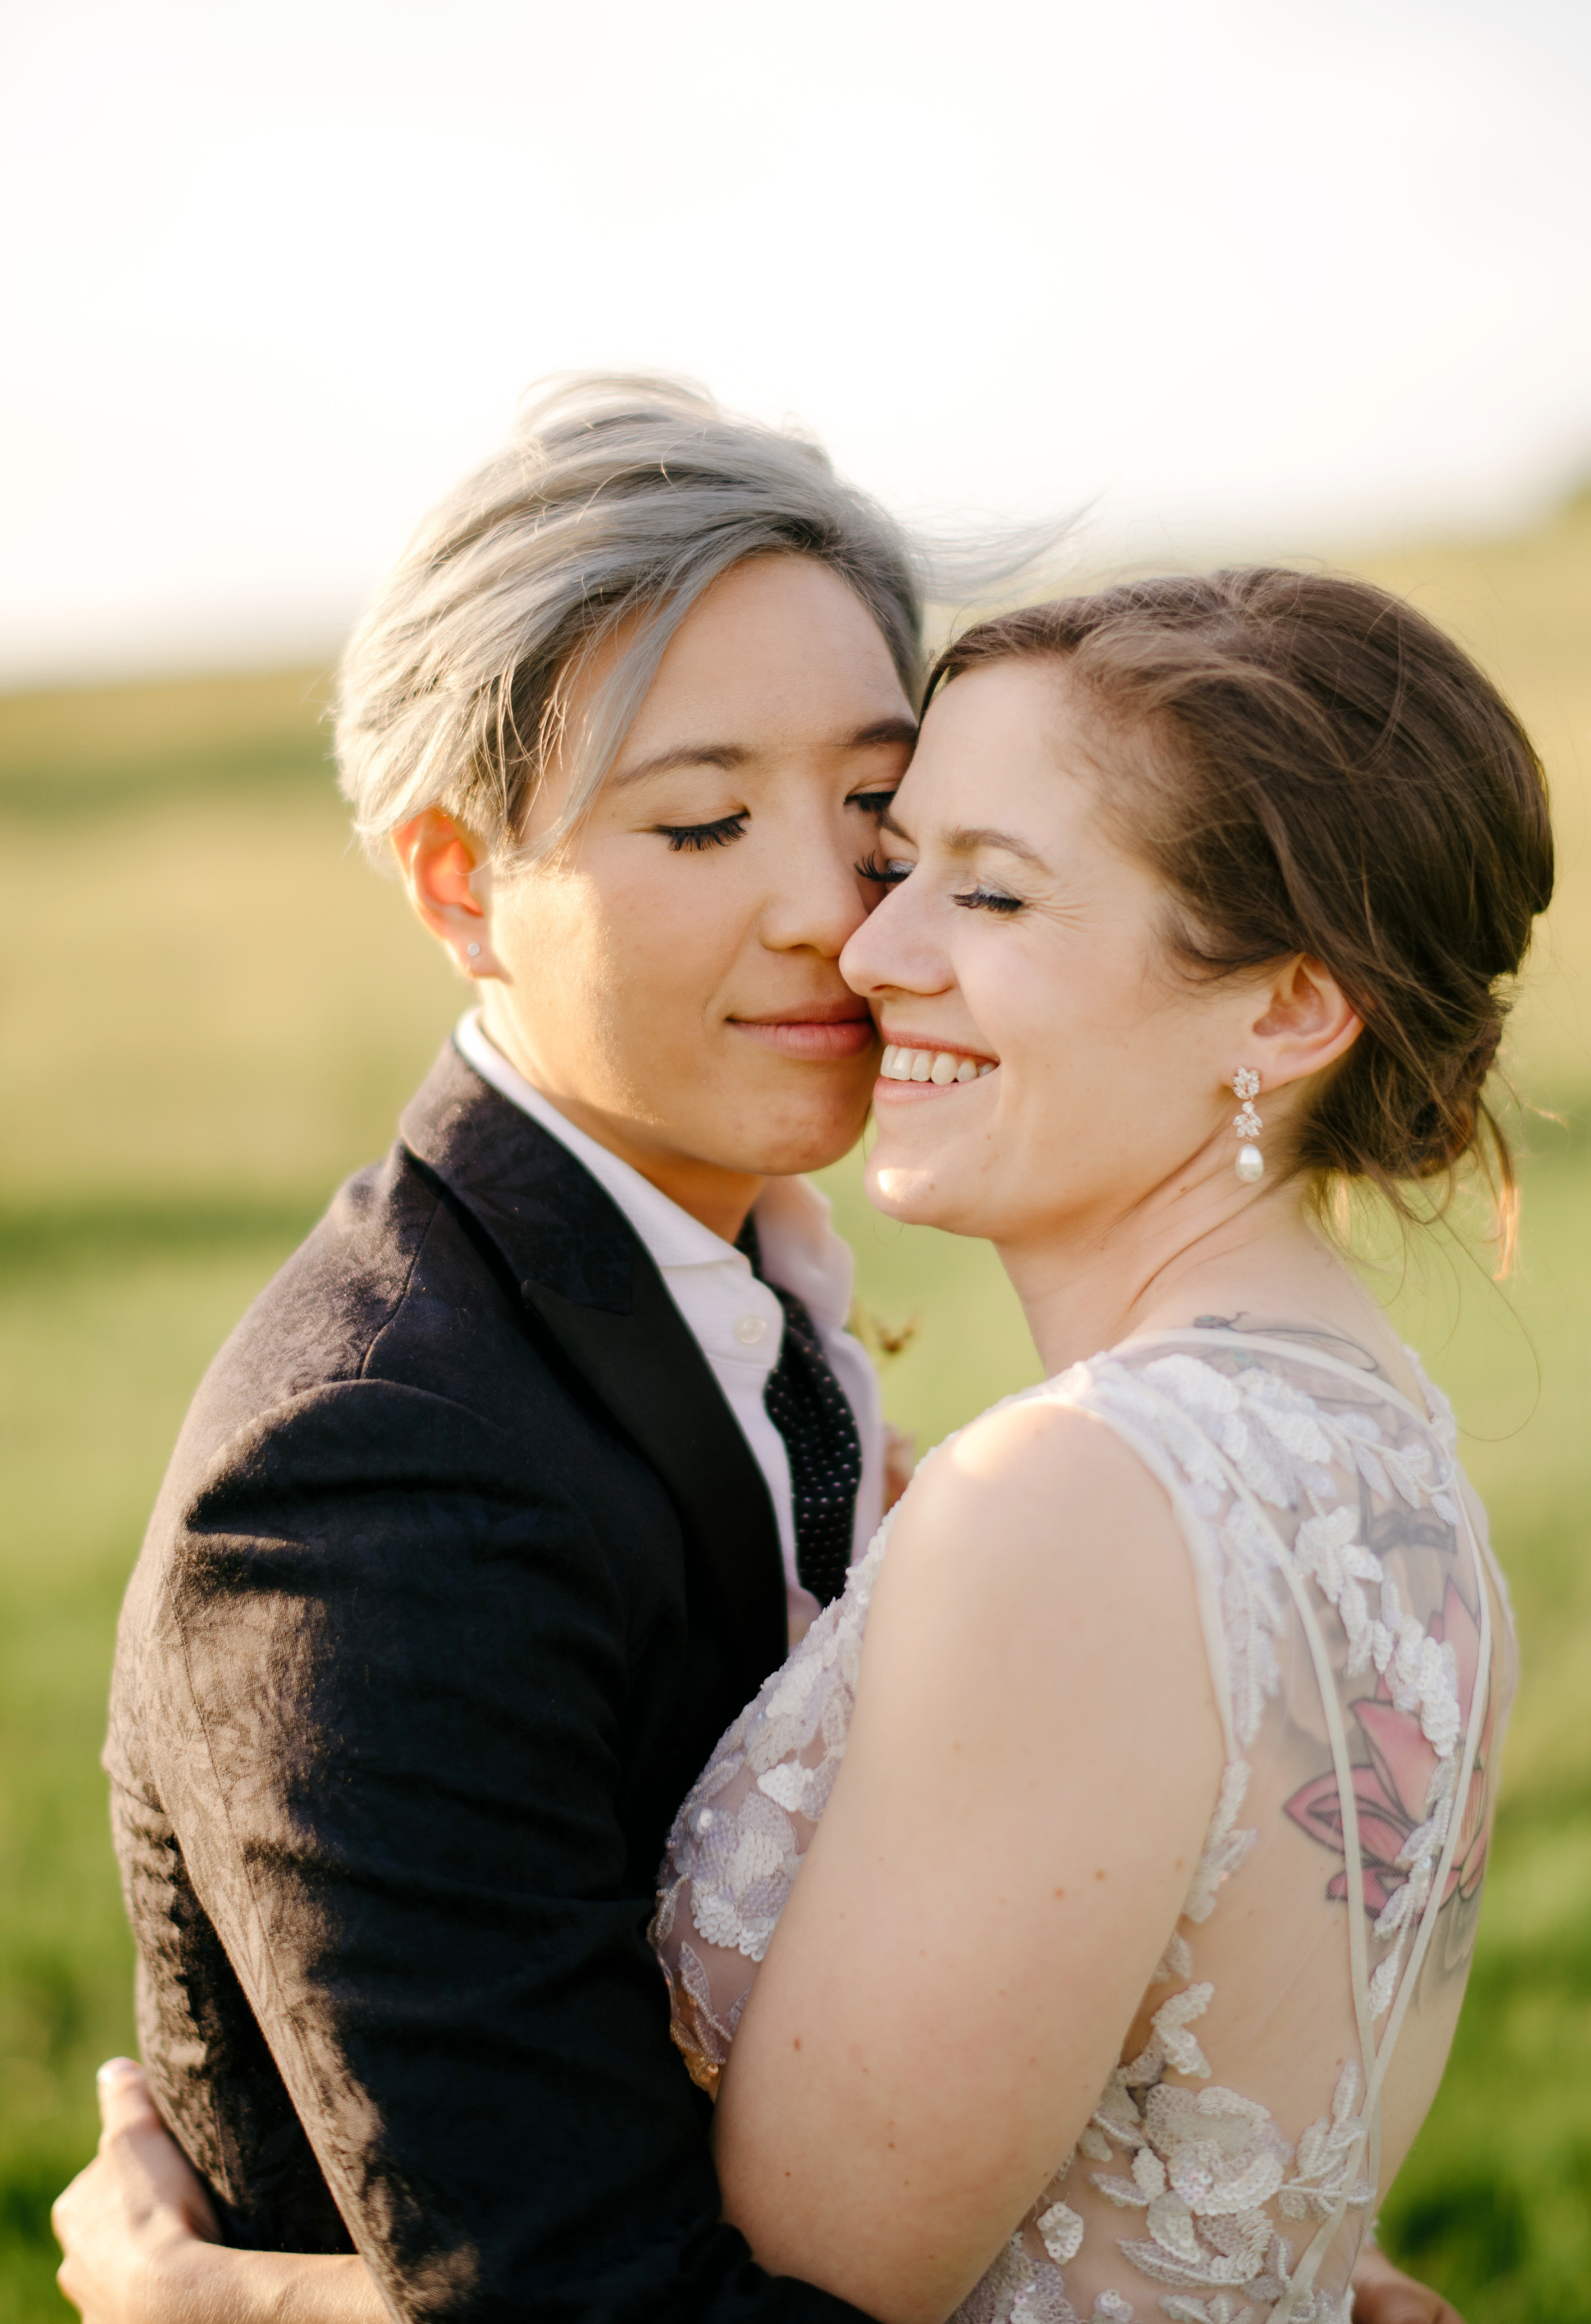 gibbet_hill_barn_same_sex_wedding_photos_61.JPG